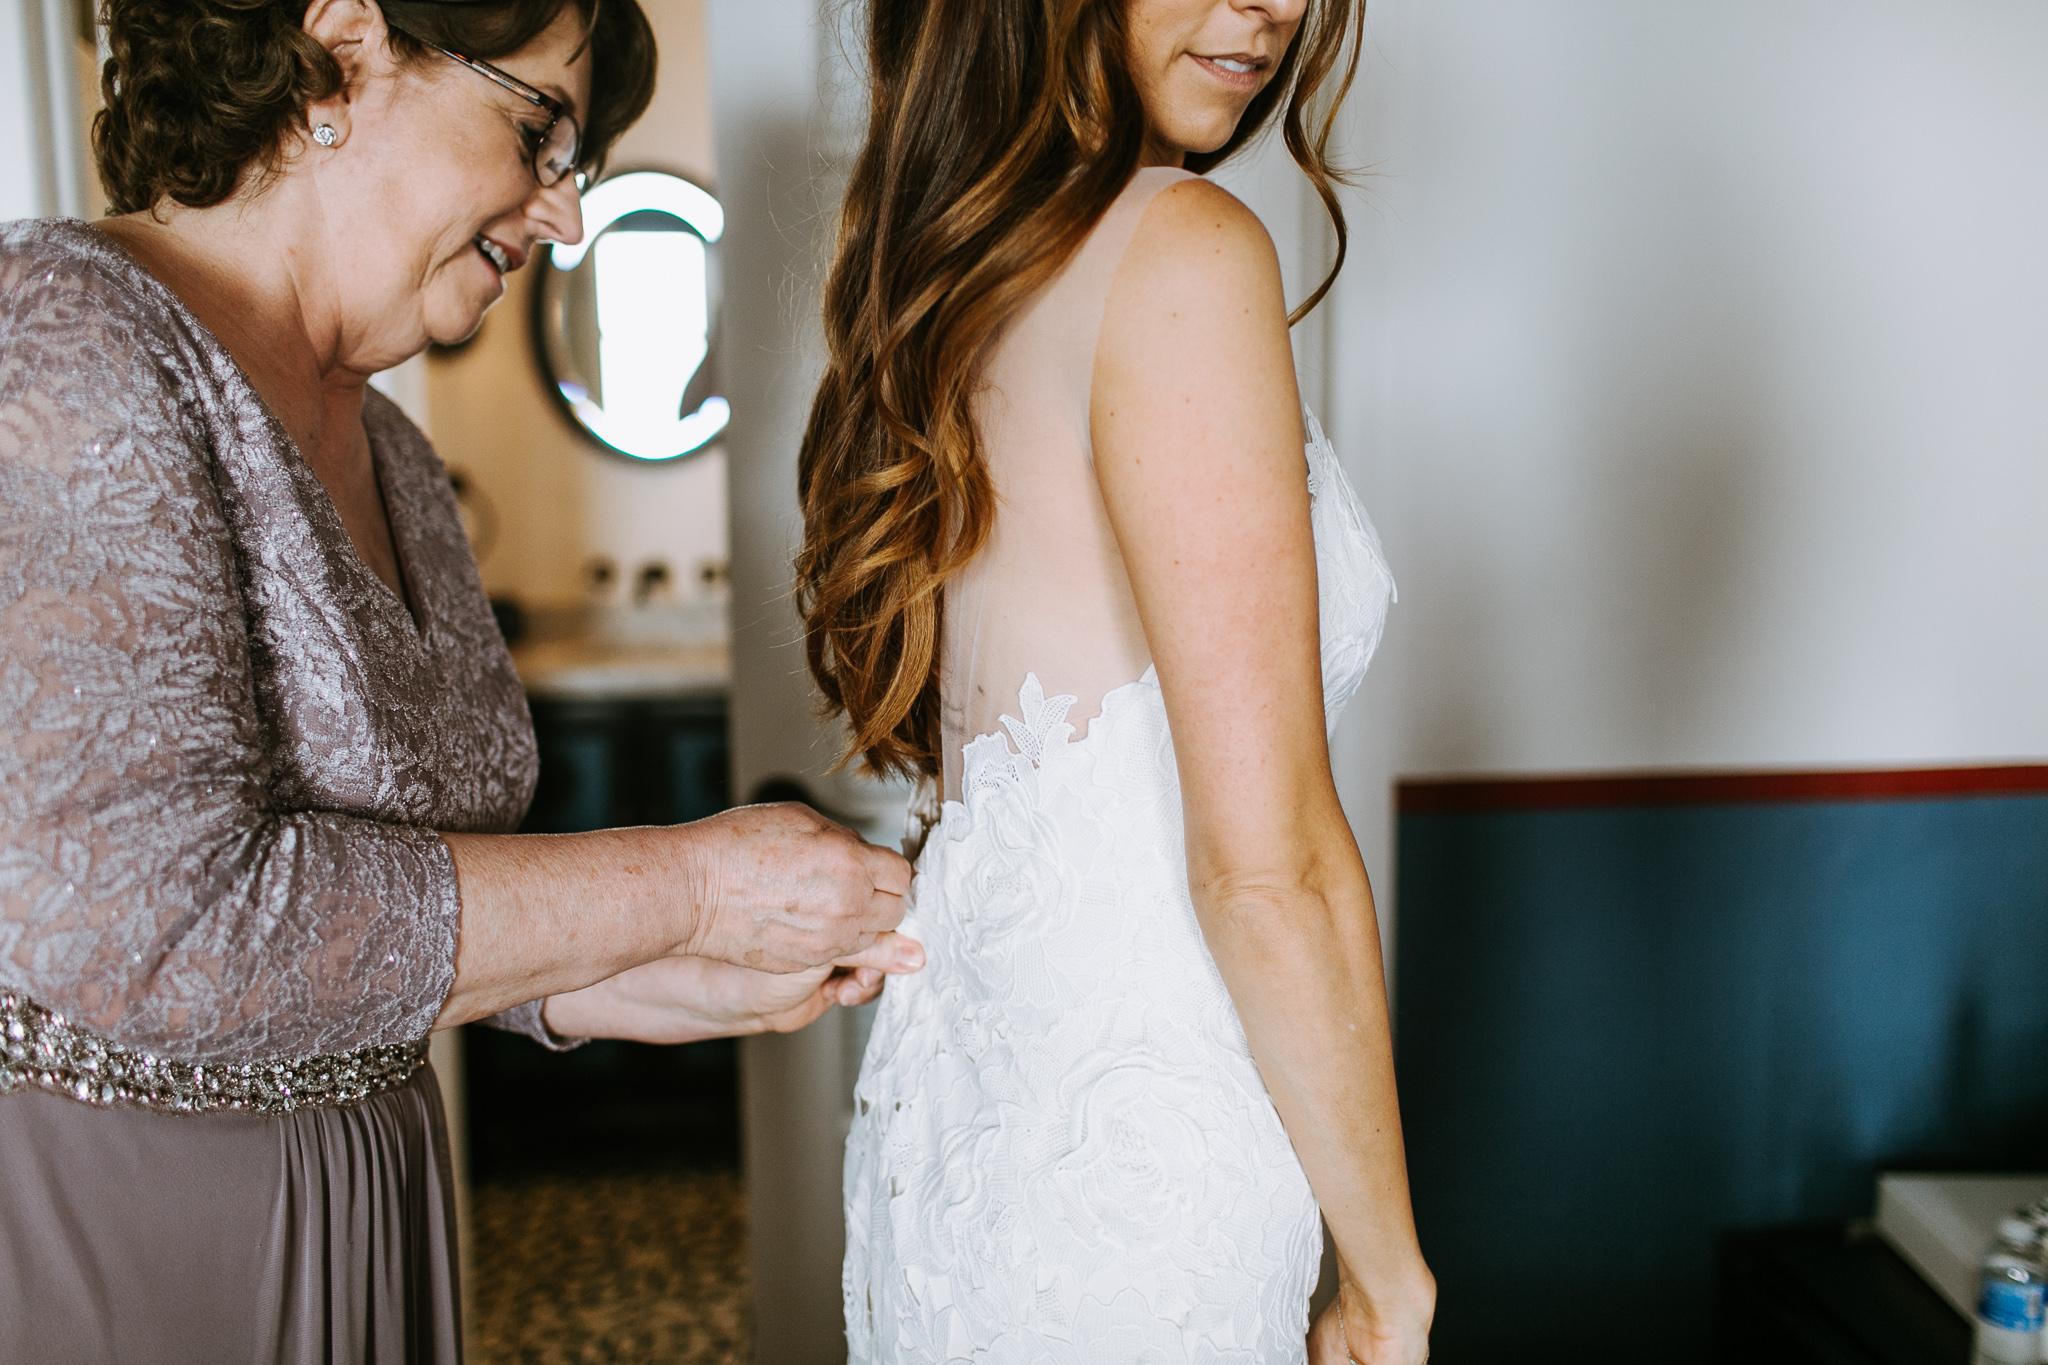 LagunaBeach-WeddingPhotographer-9.jpg